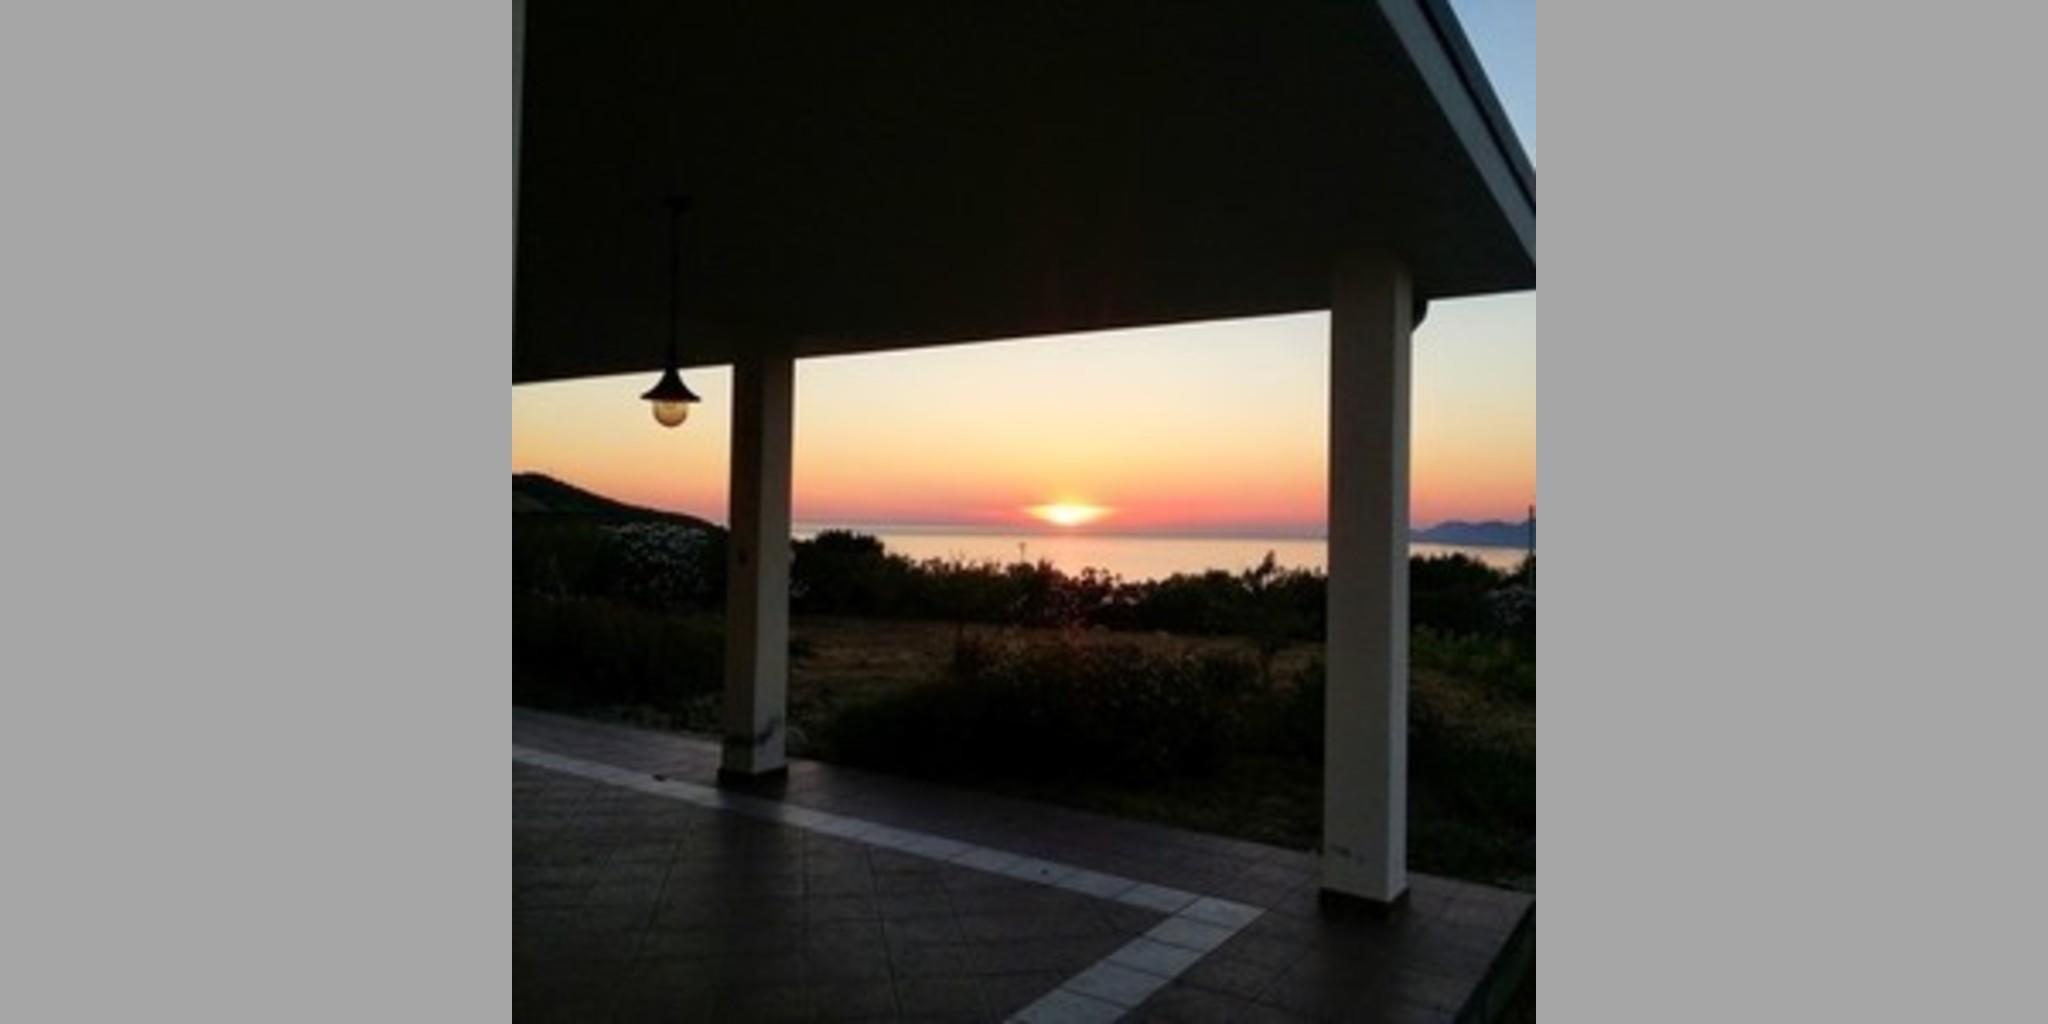 b_SAY123_20150308030542_tramonto_veranda.jpg